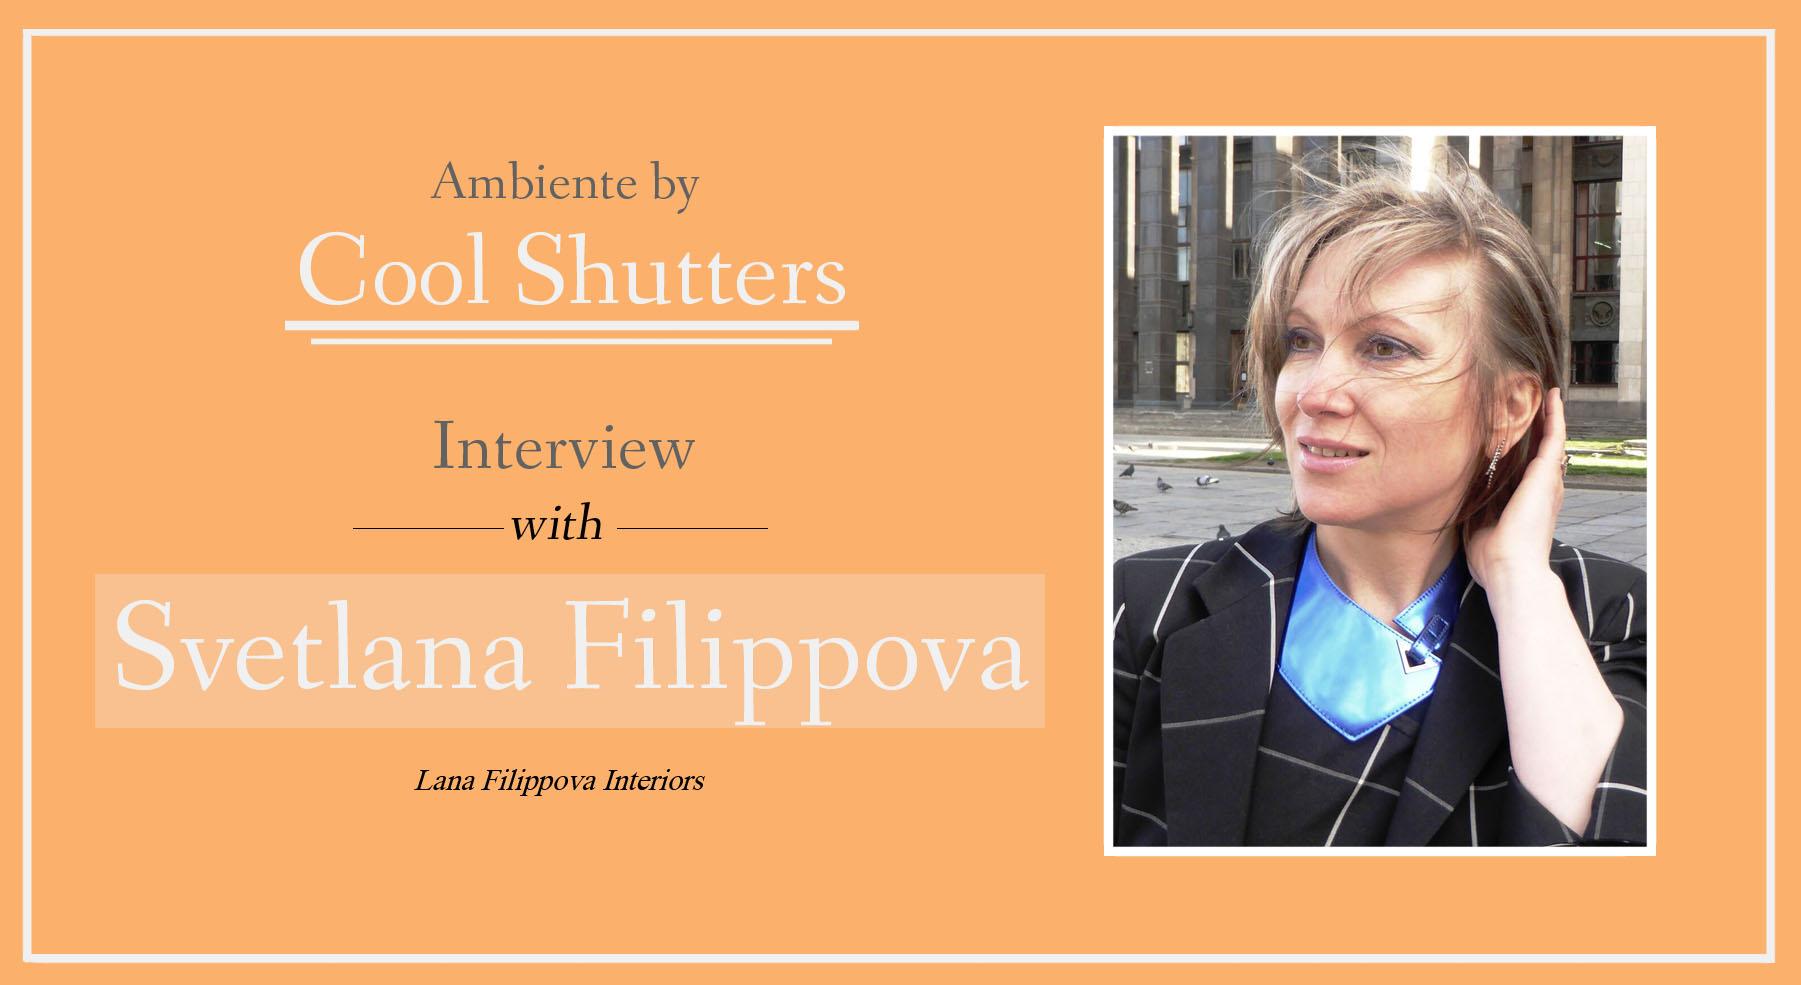 Svetlana Filippova Interview with Cool Shutters